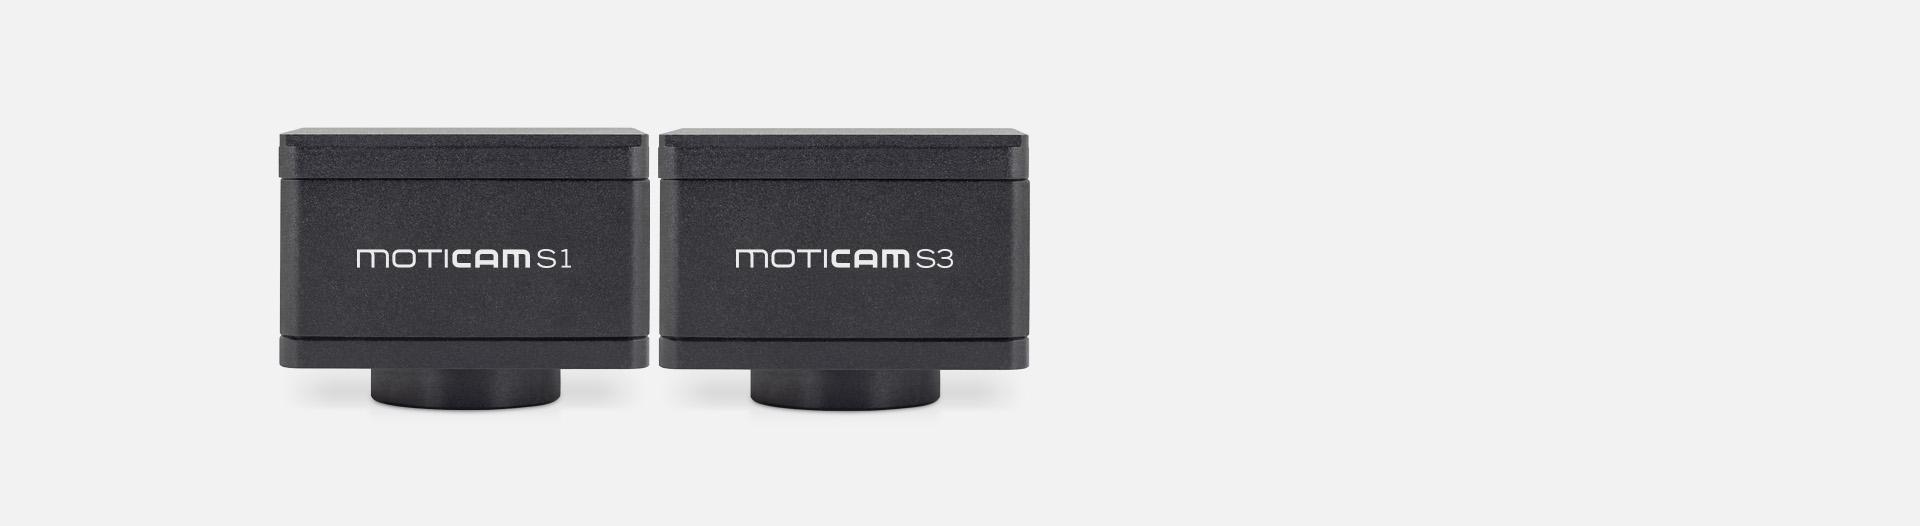 Moticam S1 & S3 USB